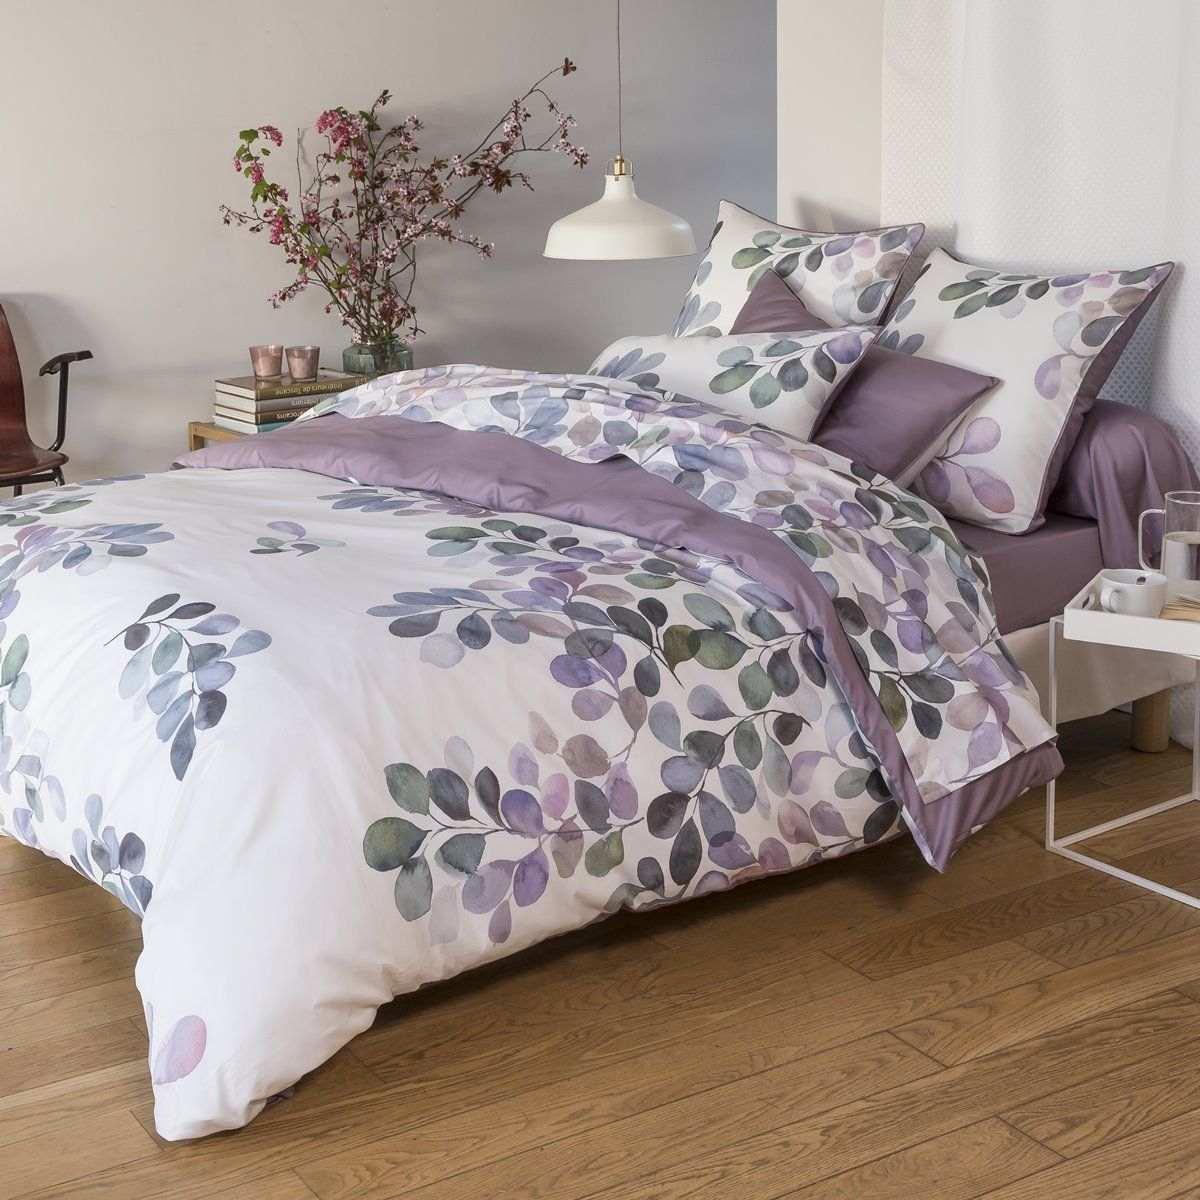 Bed set in satin de coton - Eclose